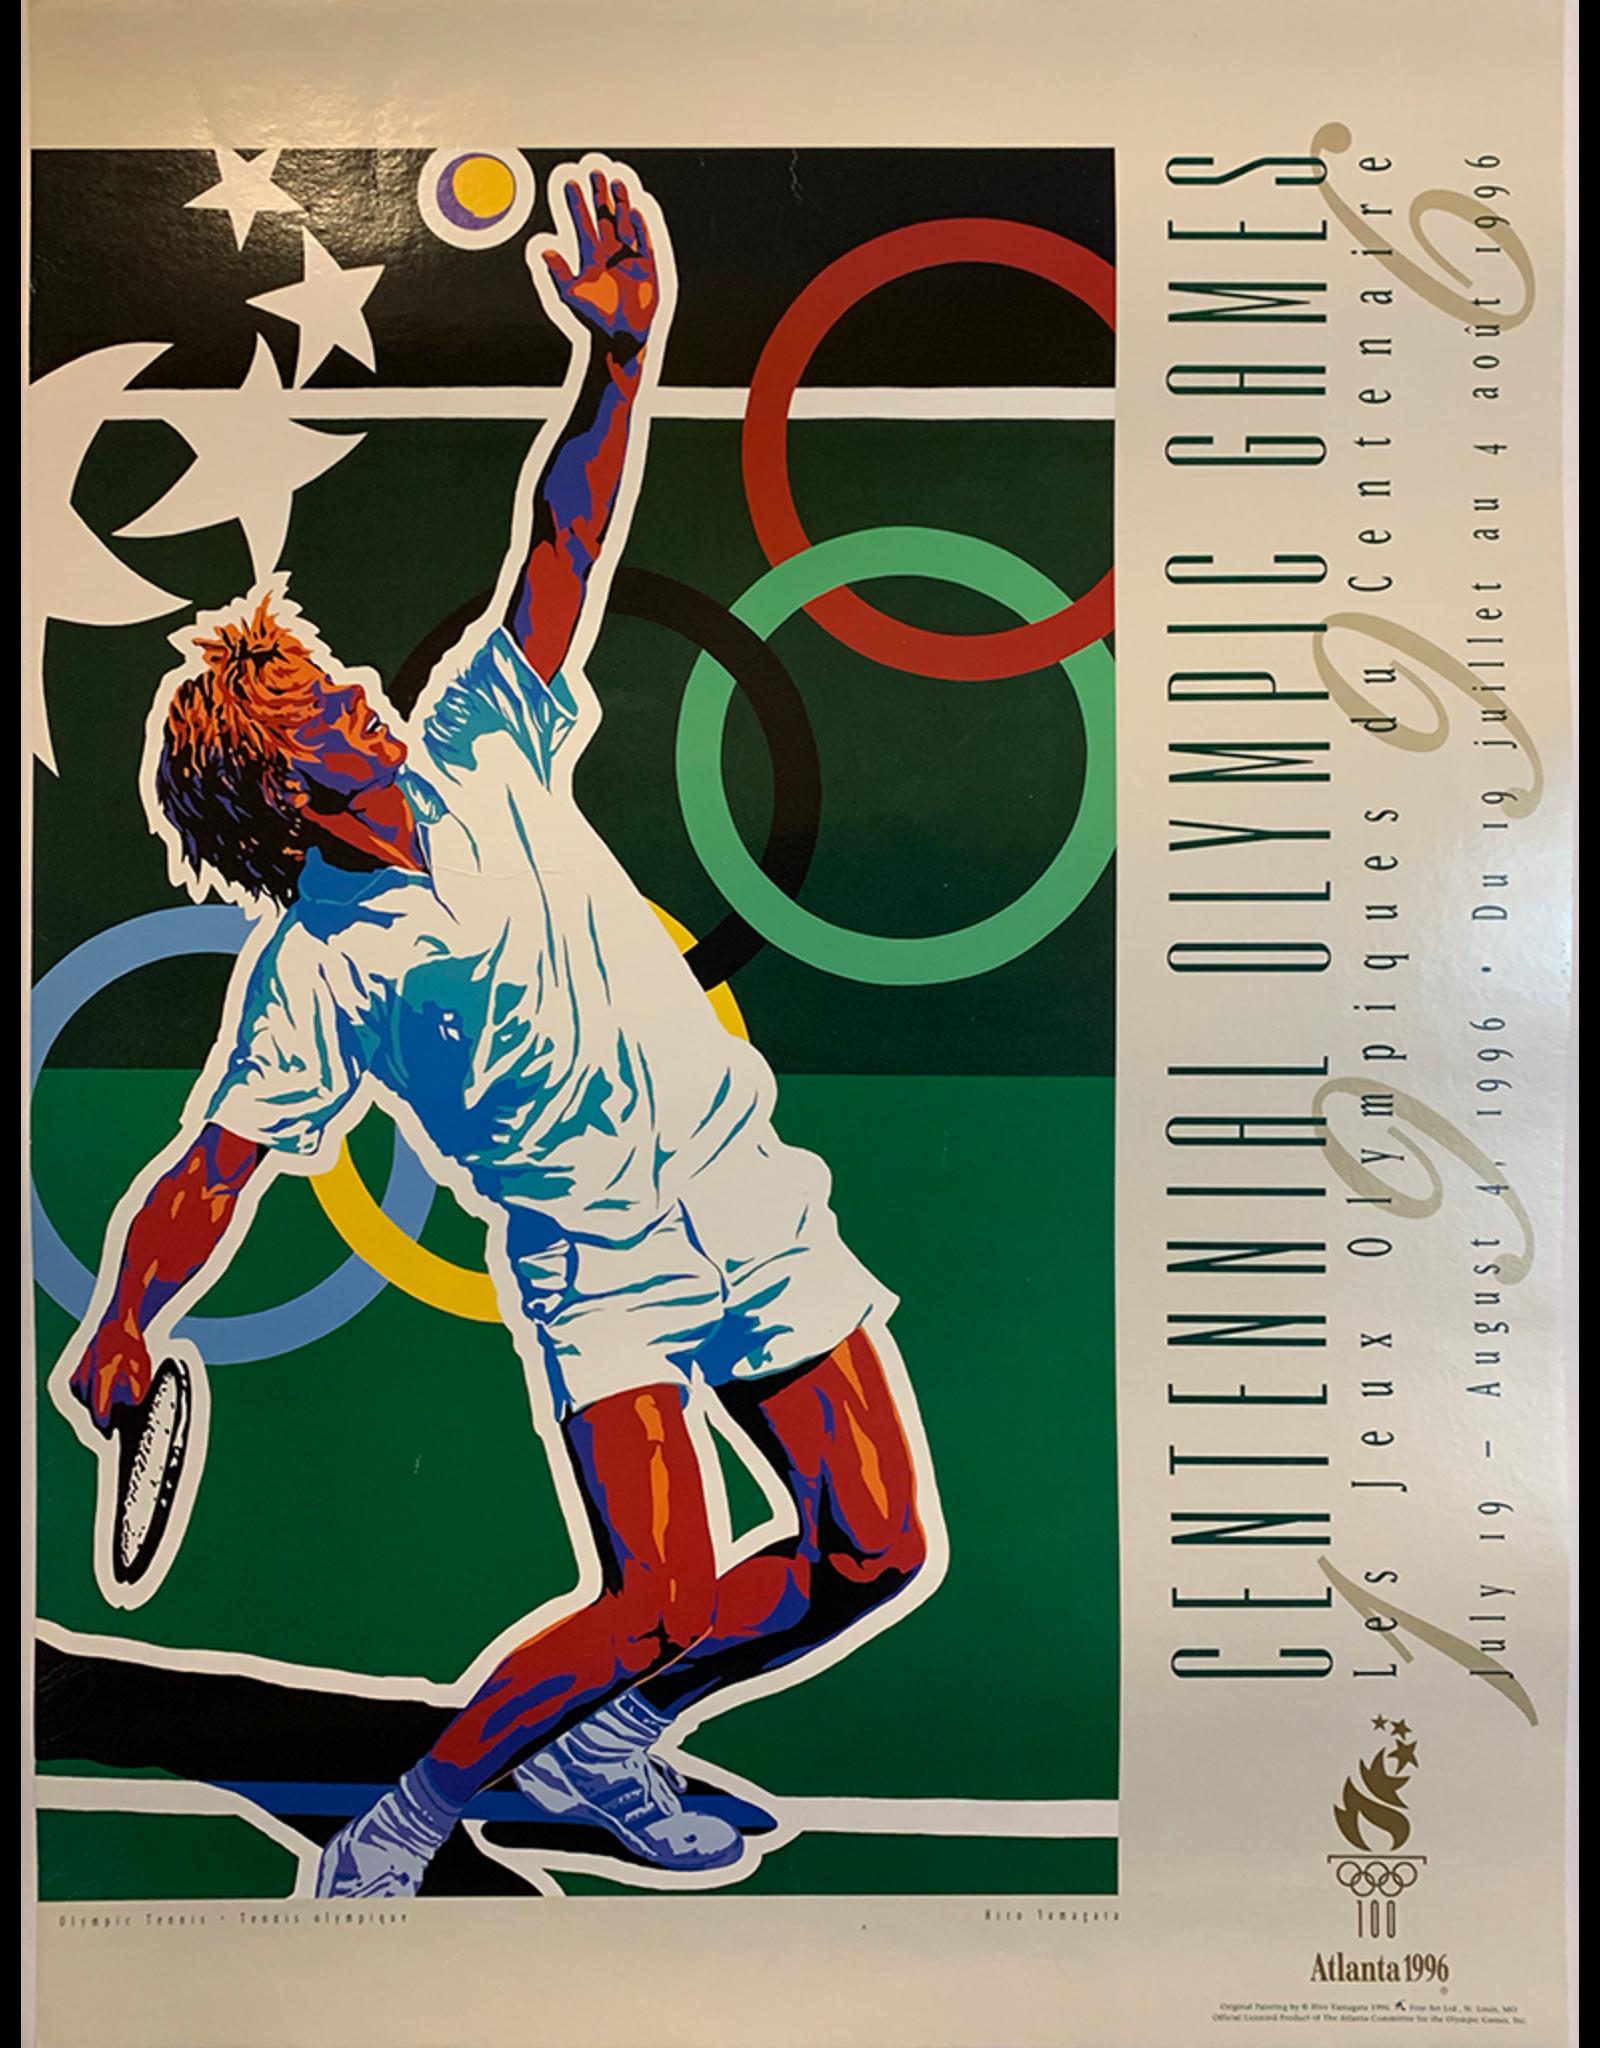 SPV Original Vintage 1996 Atlanta Olympics Poster Tennis (Yamagata)